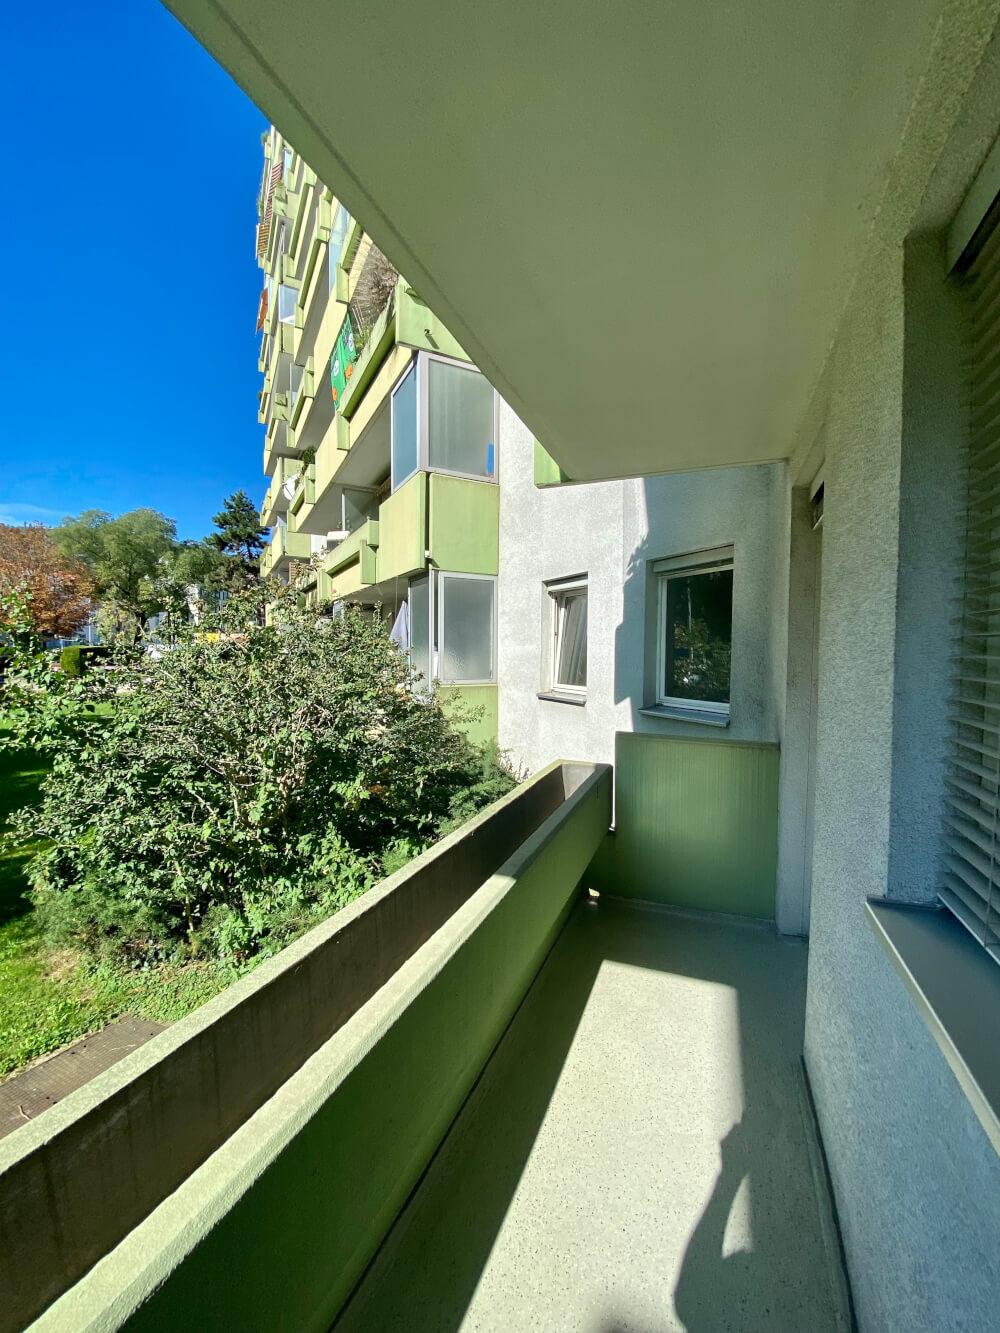 Immobilie von BWSG in Laudongasse 22a/27, 8020 Graz #2